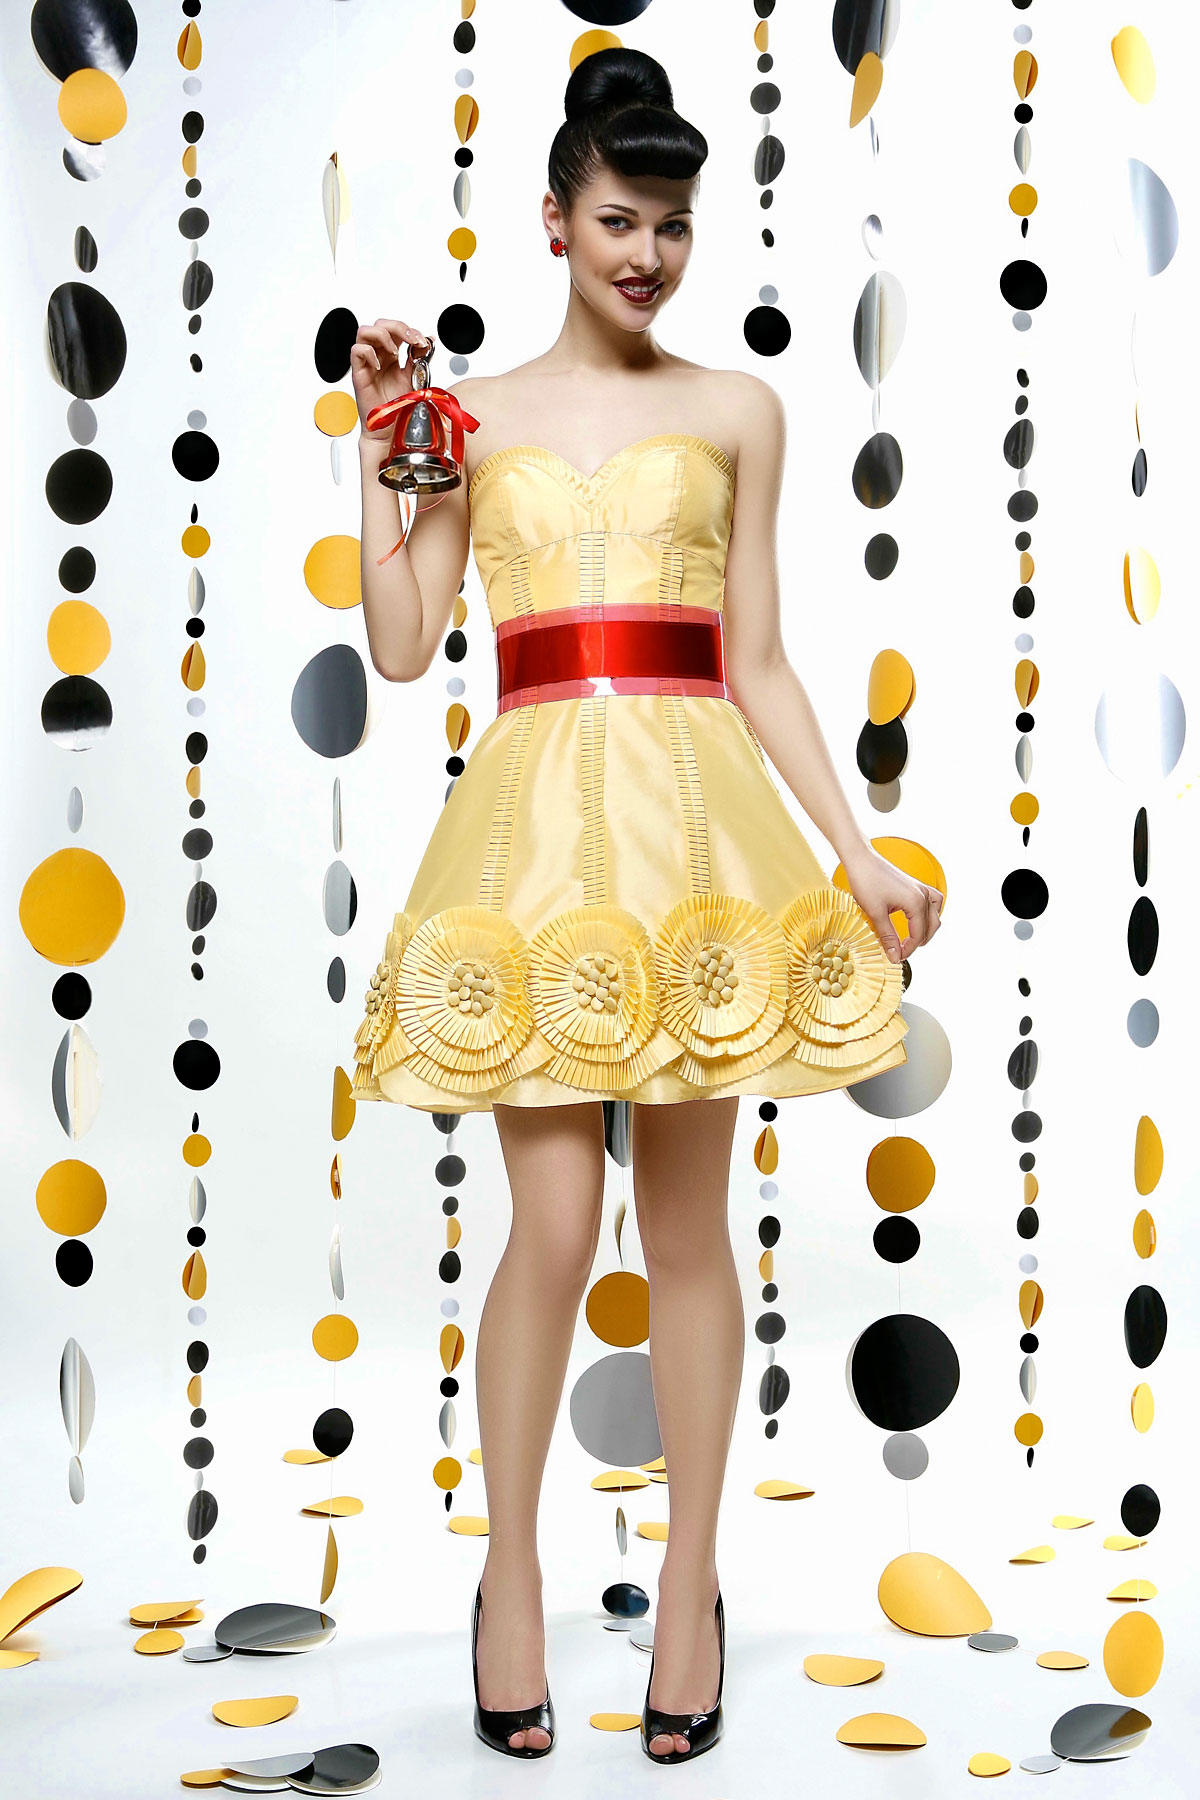 фуксия.  ПЛЮМАЖ (PLUMAGE Ceremony Project).  Особенности платья.